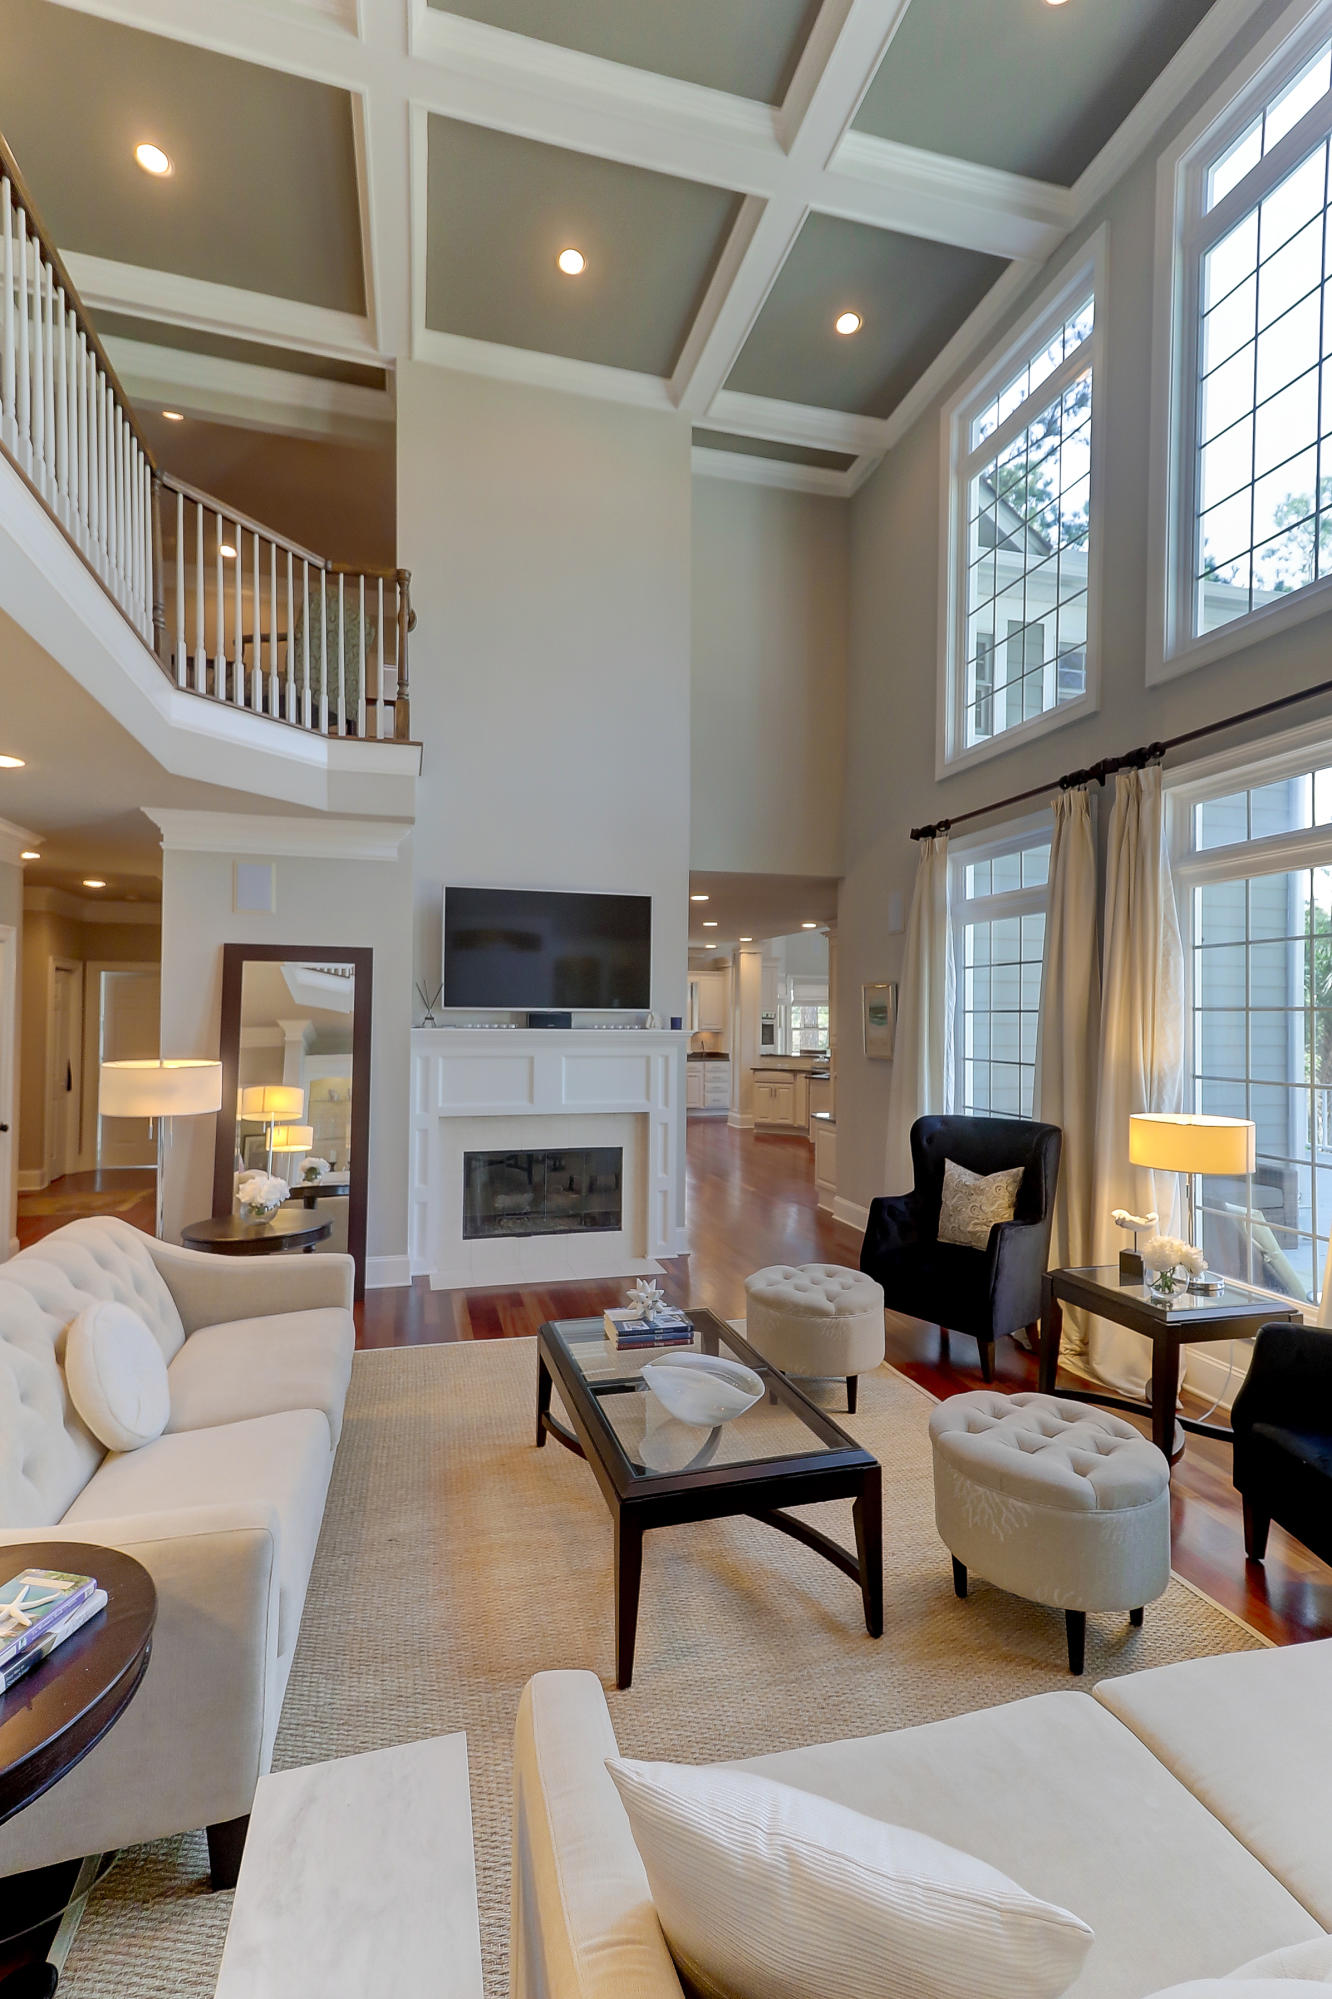 Dunes West Homes For Sale - 2996 Pignatelli Crescent, Mount Pleasant, SC - 53